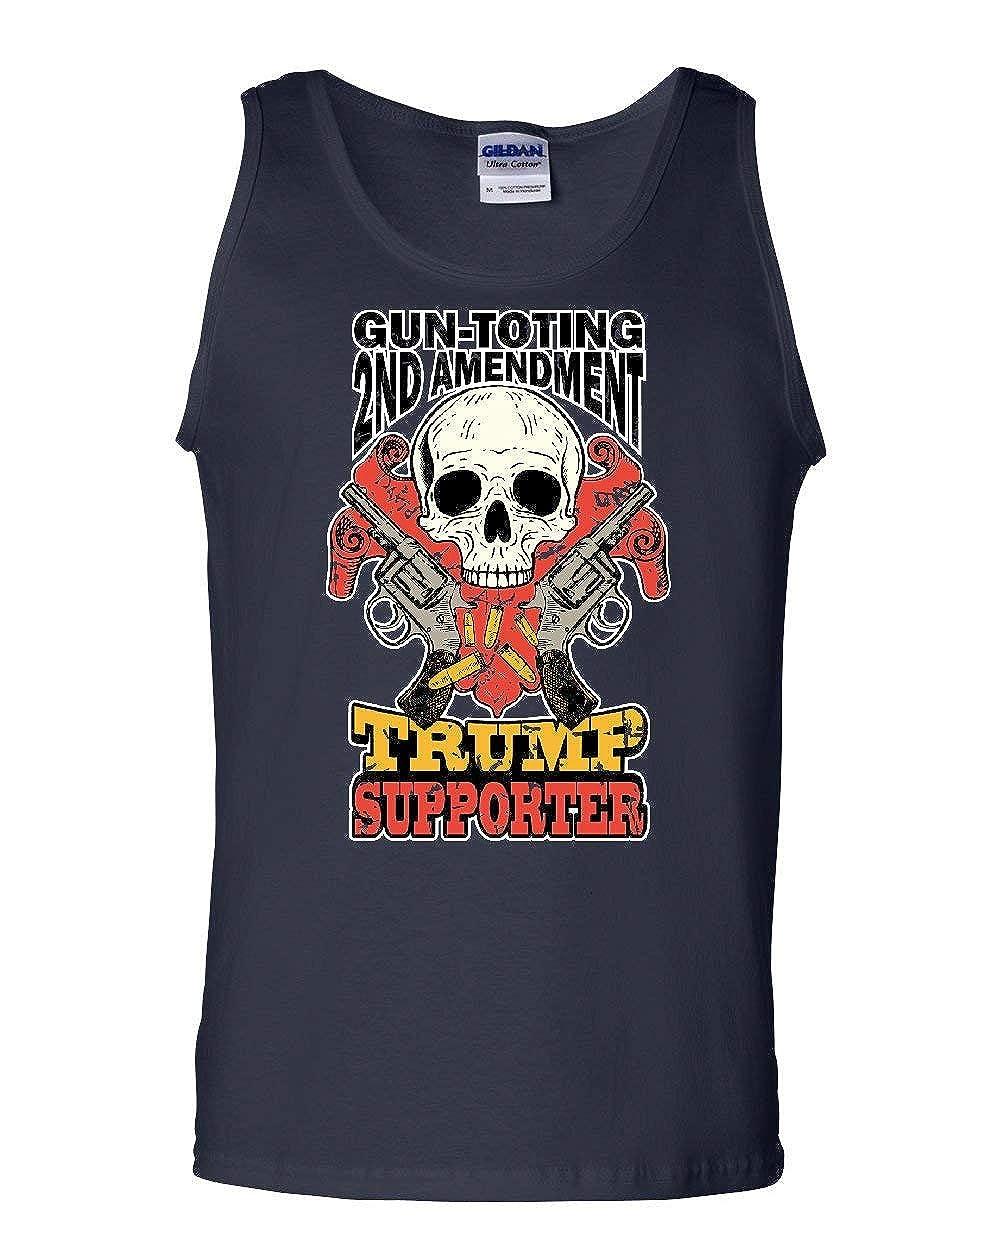 Tee Hunt Gun-Toting Trump Supporter Tank Top 2nd Amendment Skull Revolvers Sleeveless